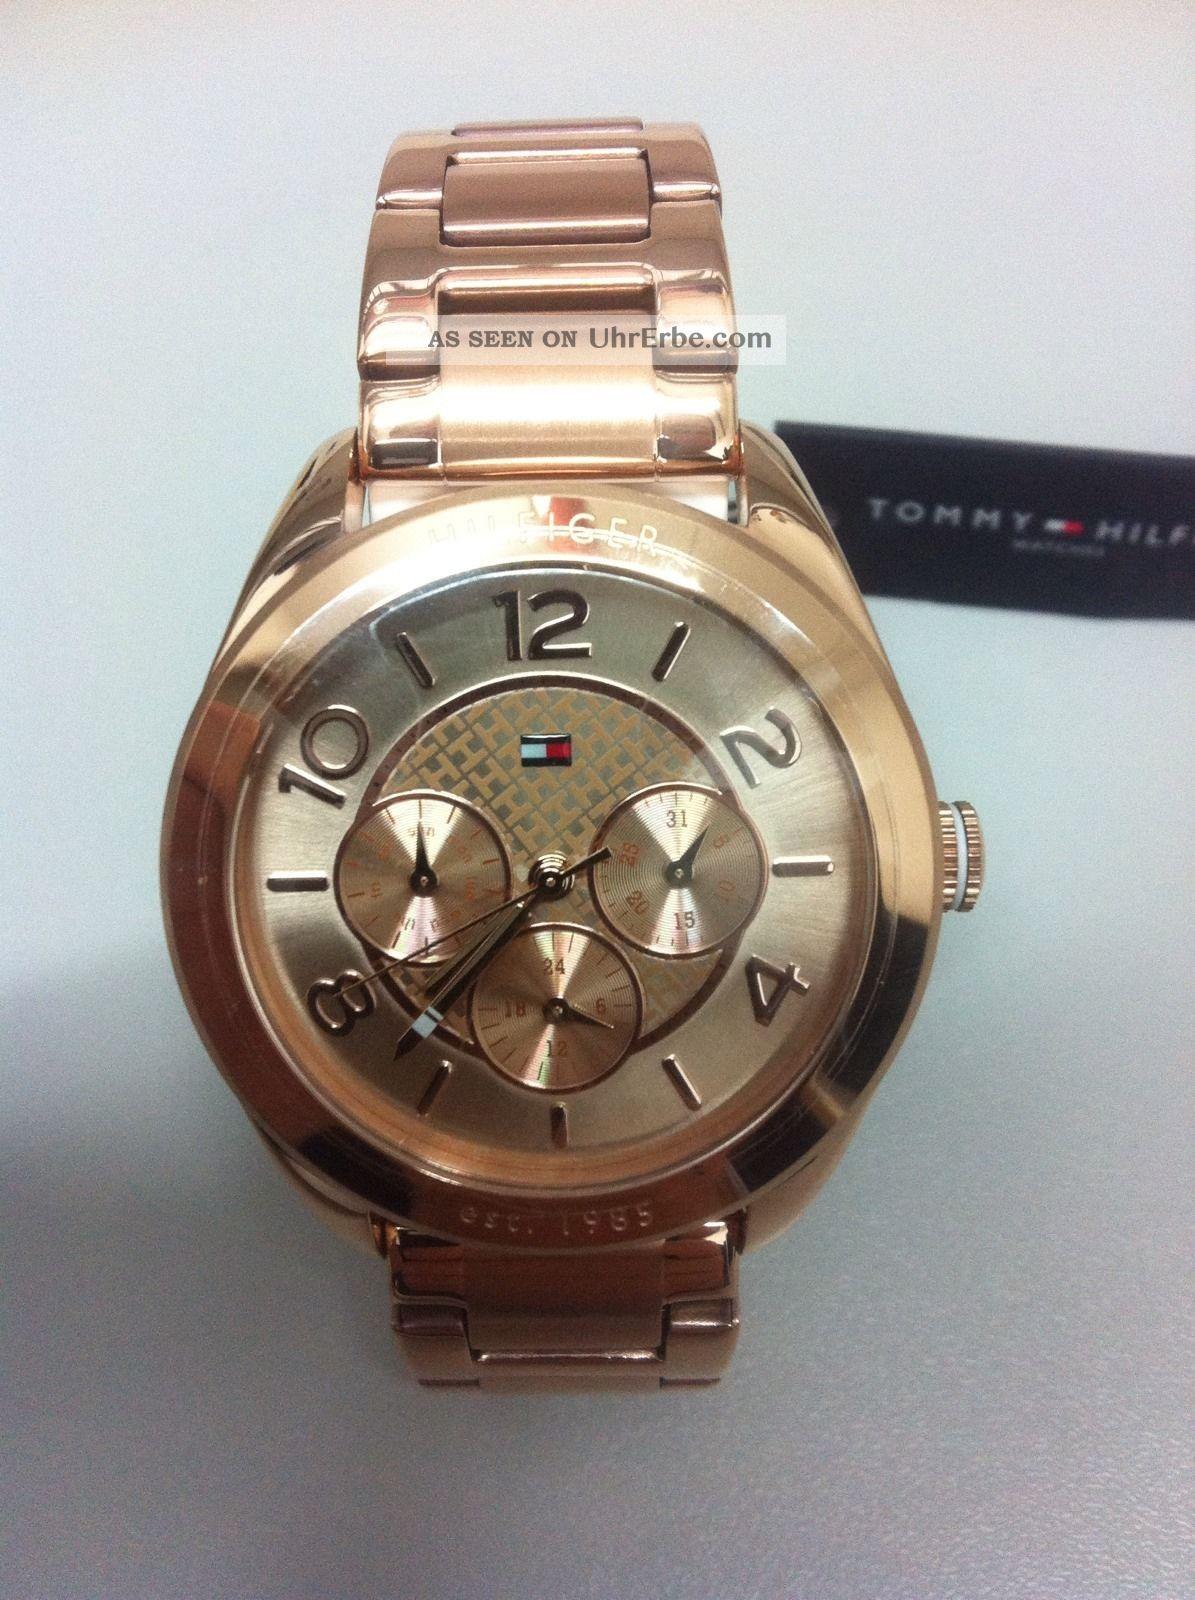 Tommy Hilfiger Damen Uhr Rosé Chronograph Armbanduhren Bild